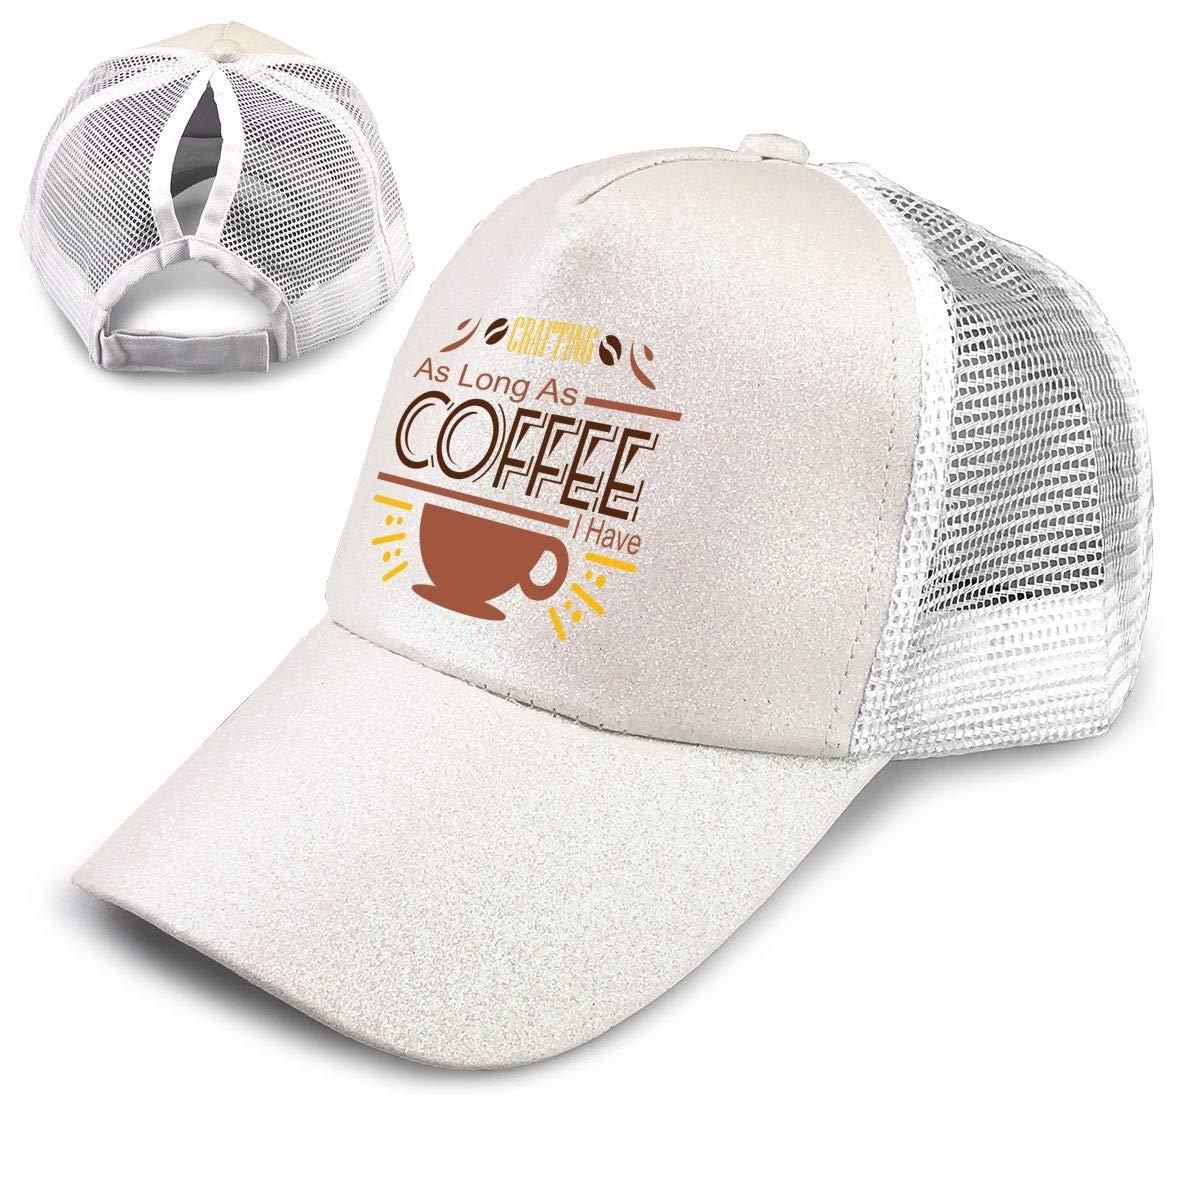 Crafting As Long As Coffee I Have Ponytail Messy High Bun Hat Ponycaps Baseball Cap Adjustable Trucker Cap Mesh Cap